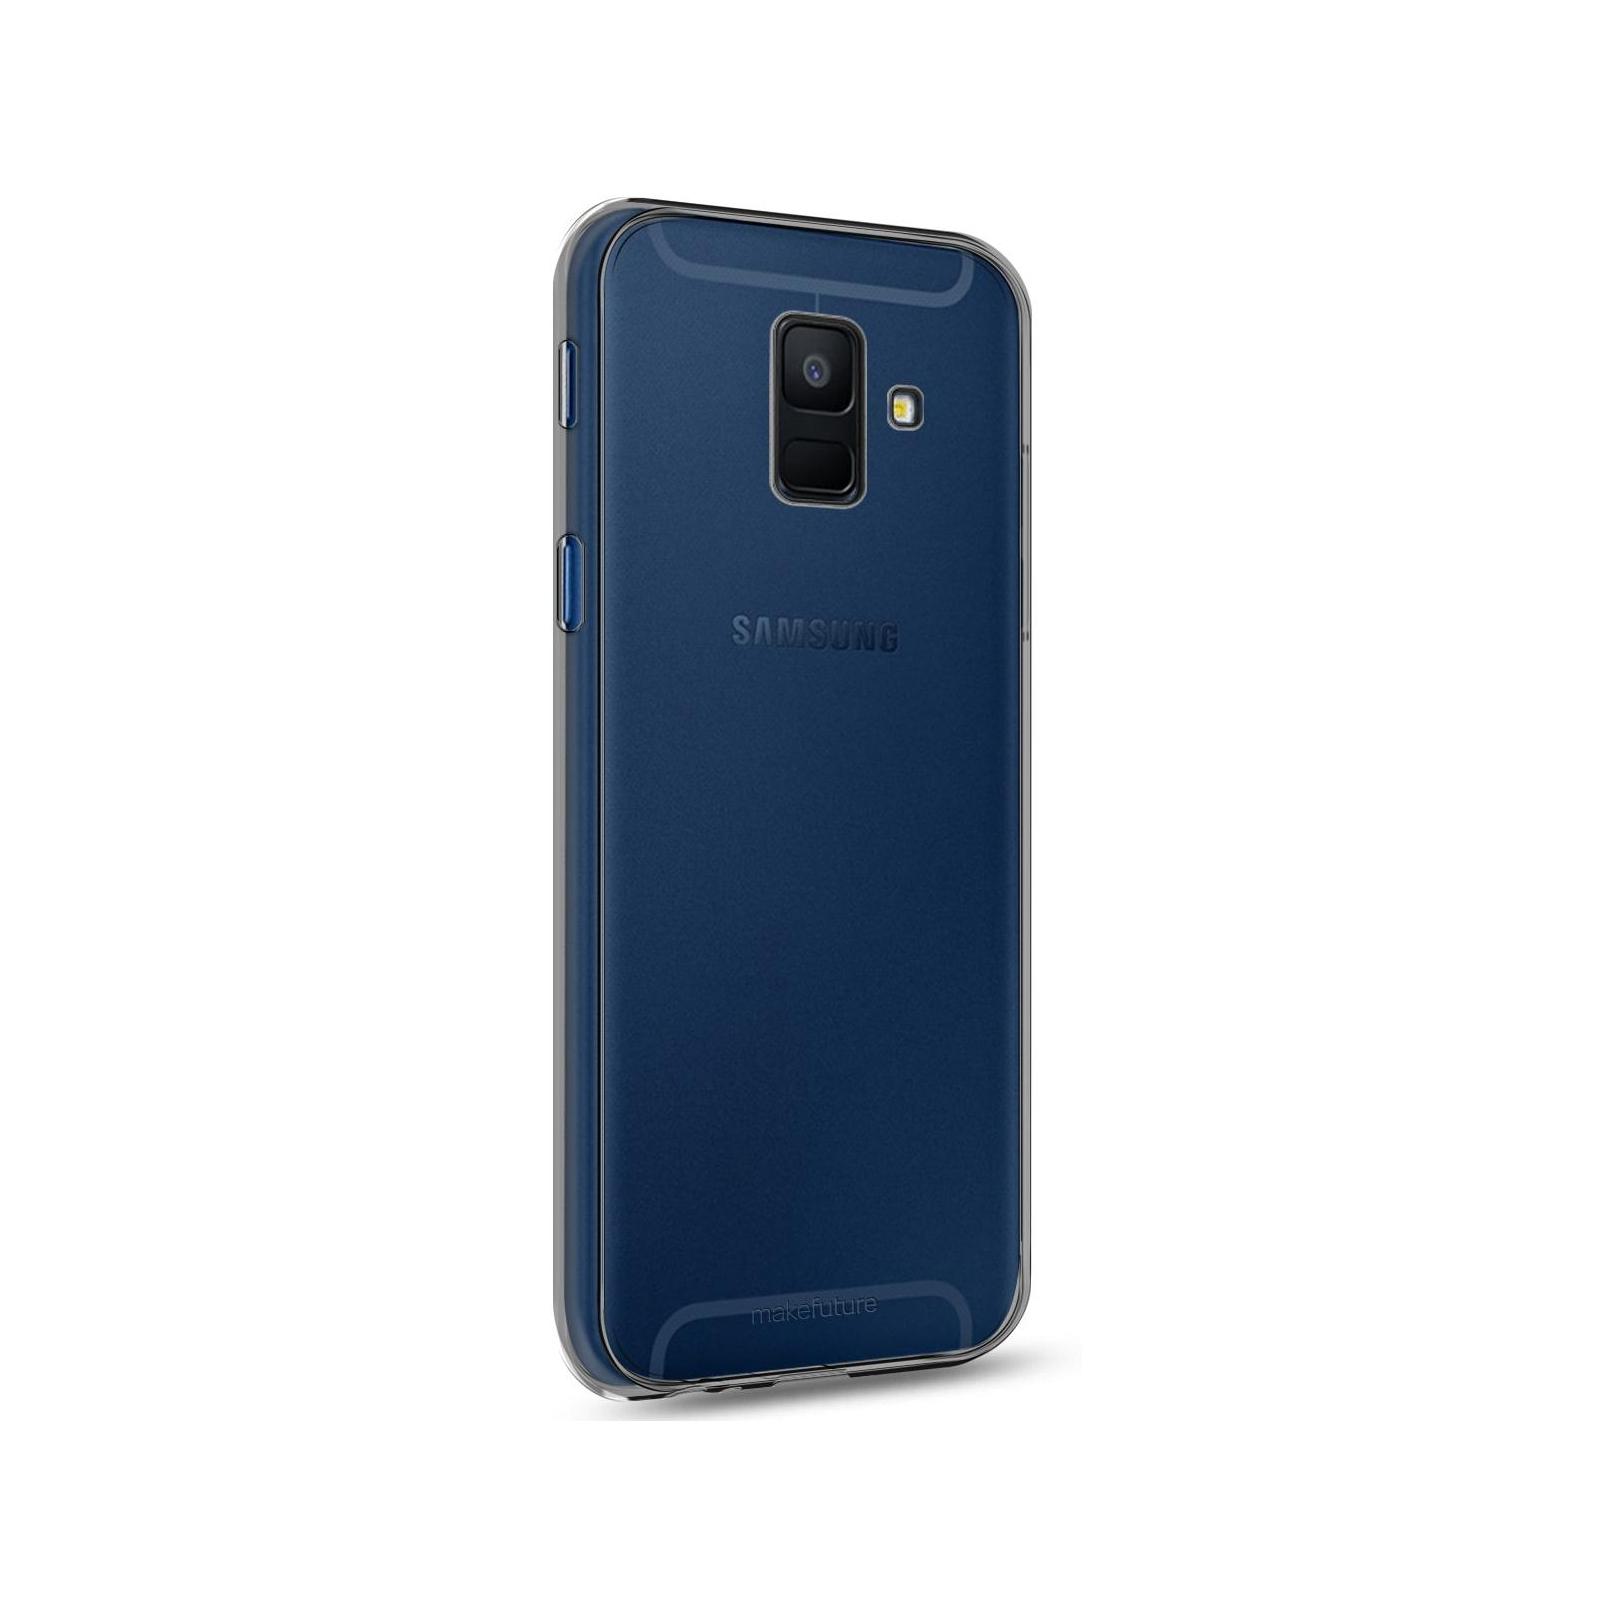 Чехол для моб. телефона MakeFuture Air Case (Clear TPU) Samsung A6 2018 Black (MCA-SA618BK) изображение 2